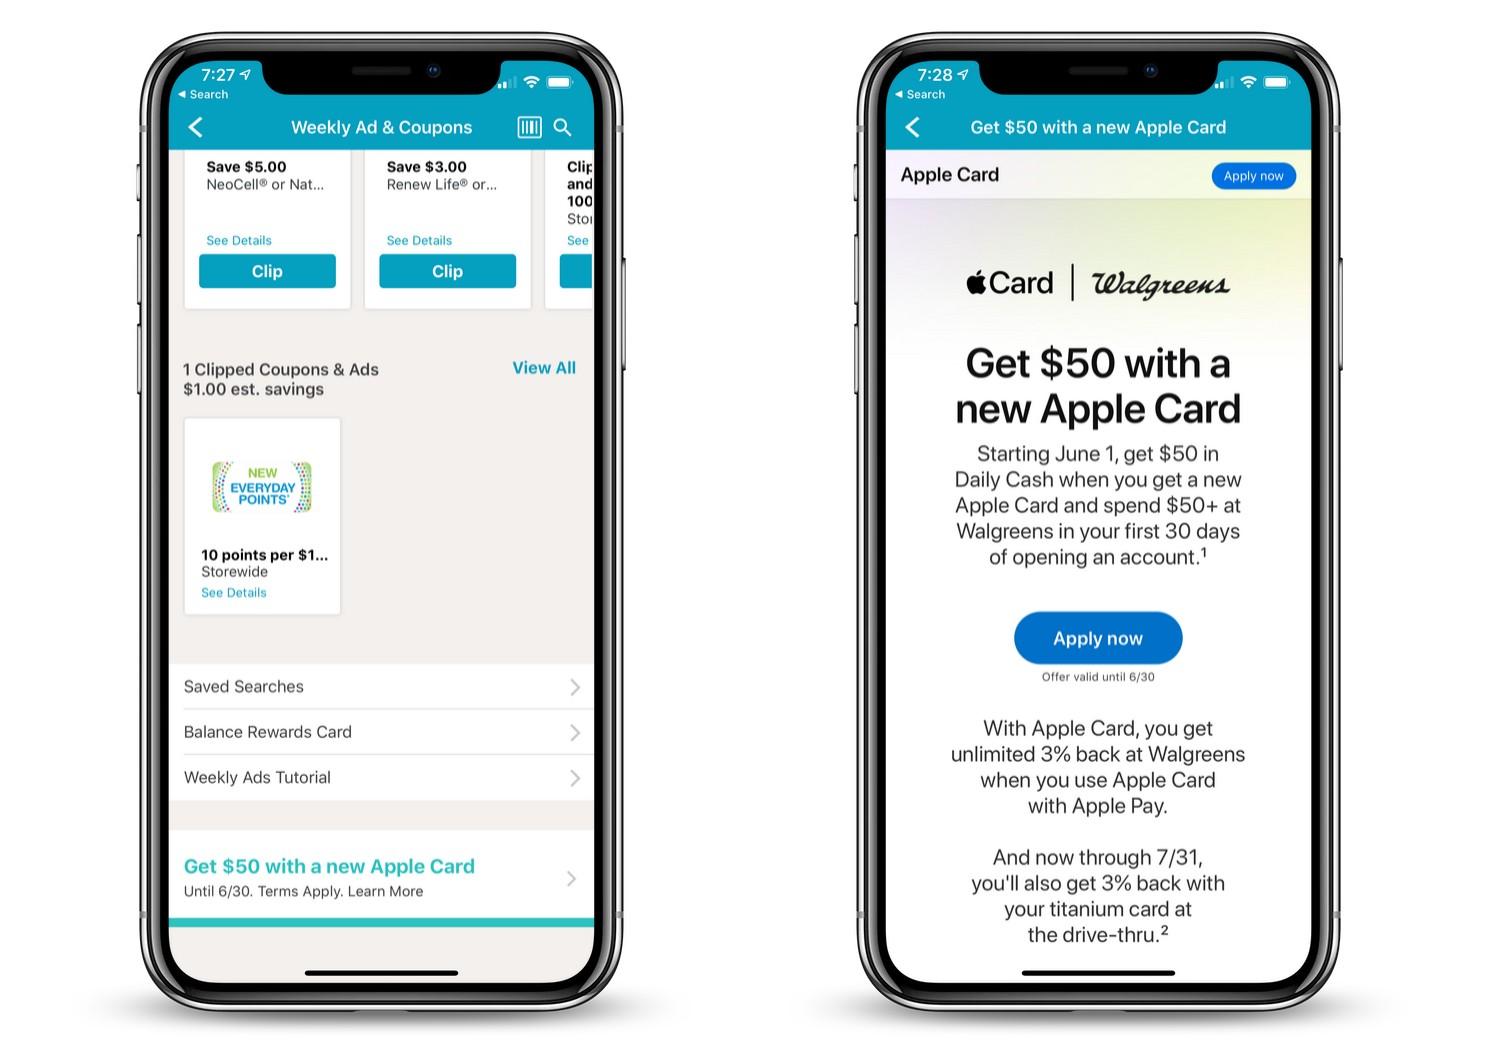 Walgreens Apple Card Offer